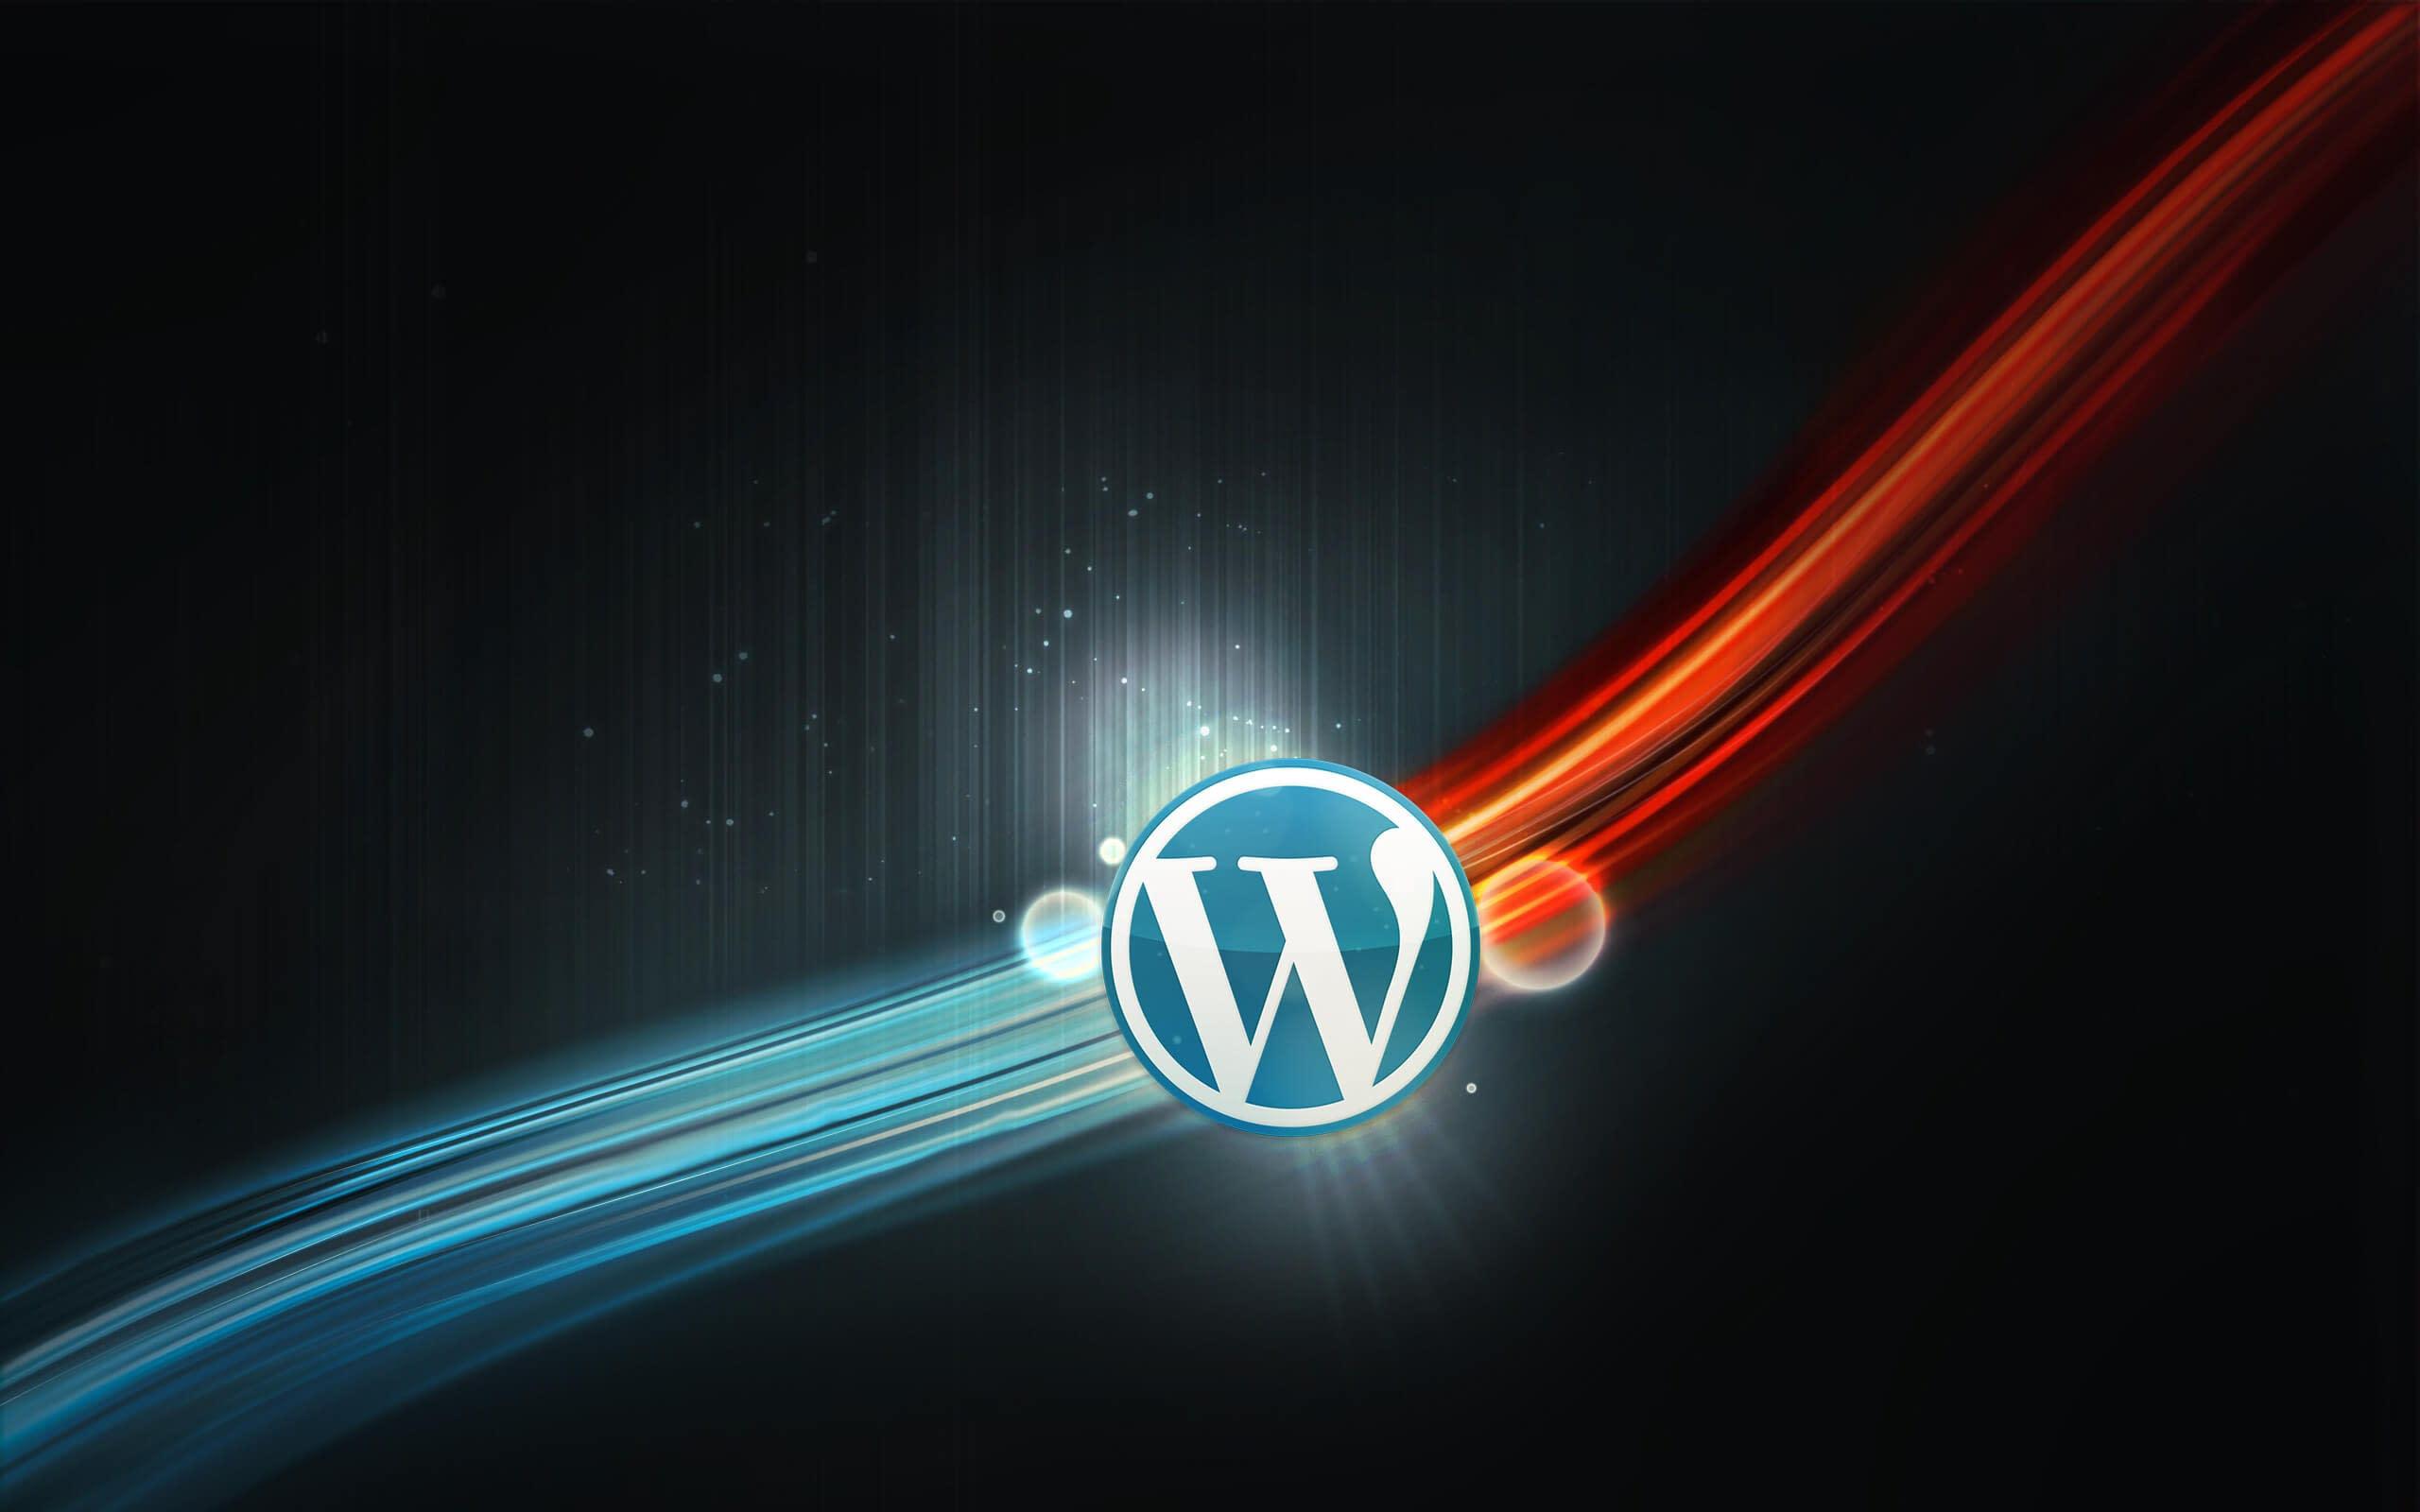 WordPress-wallpaper-3